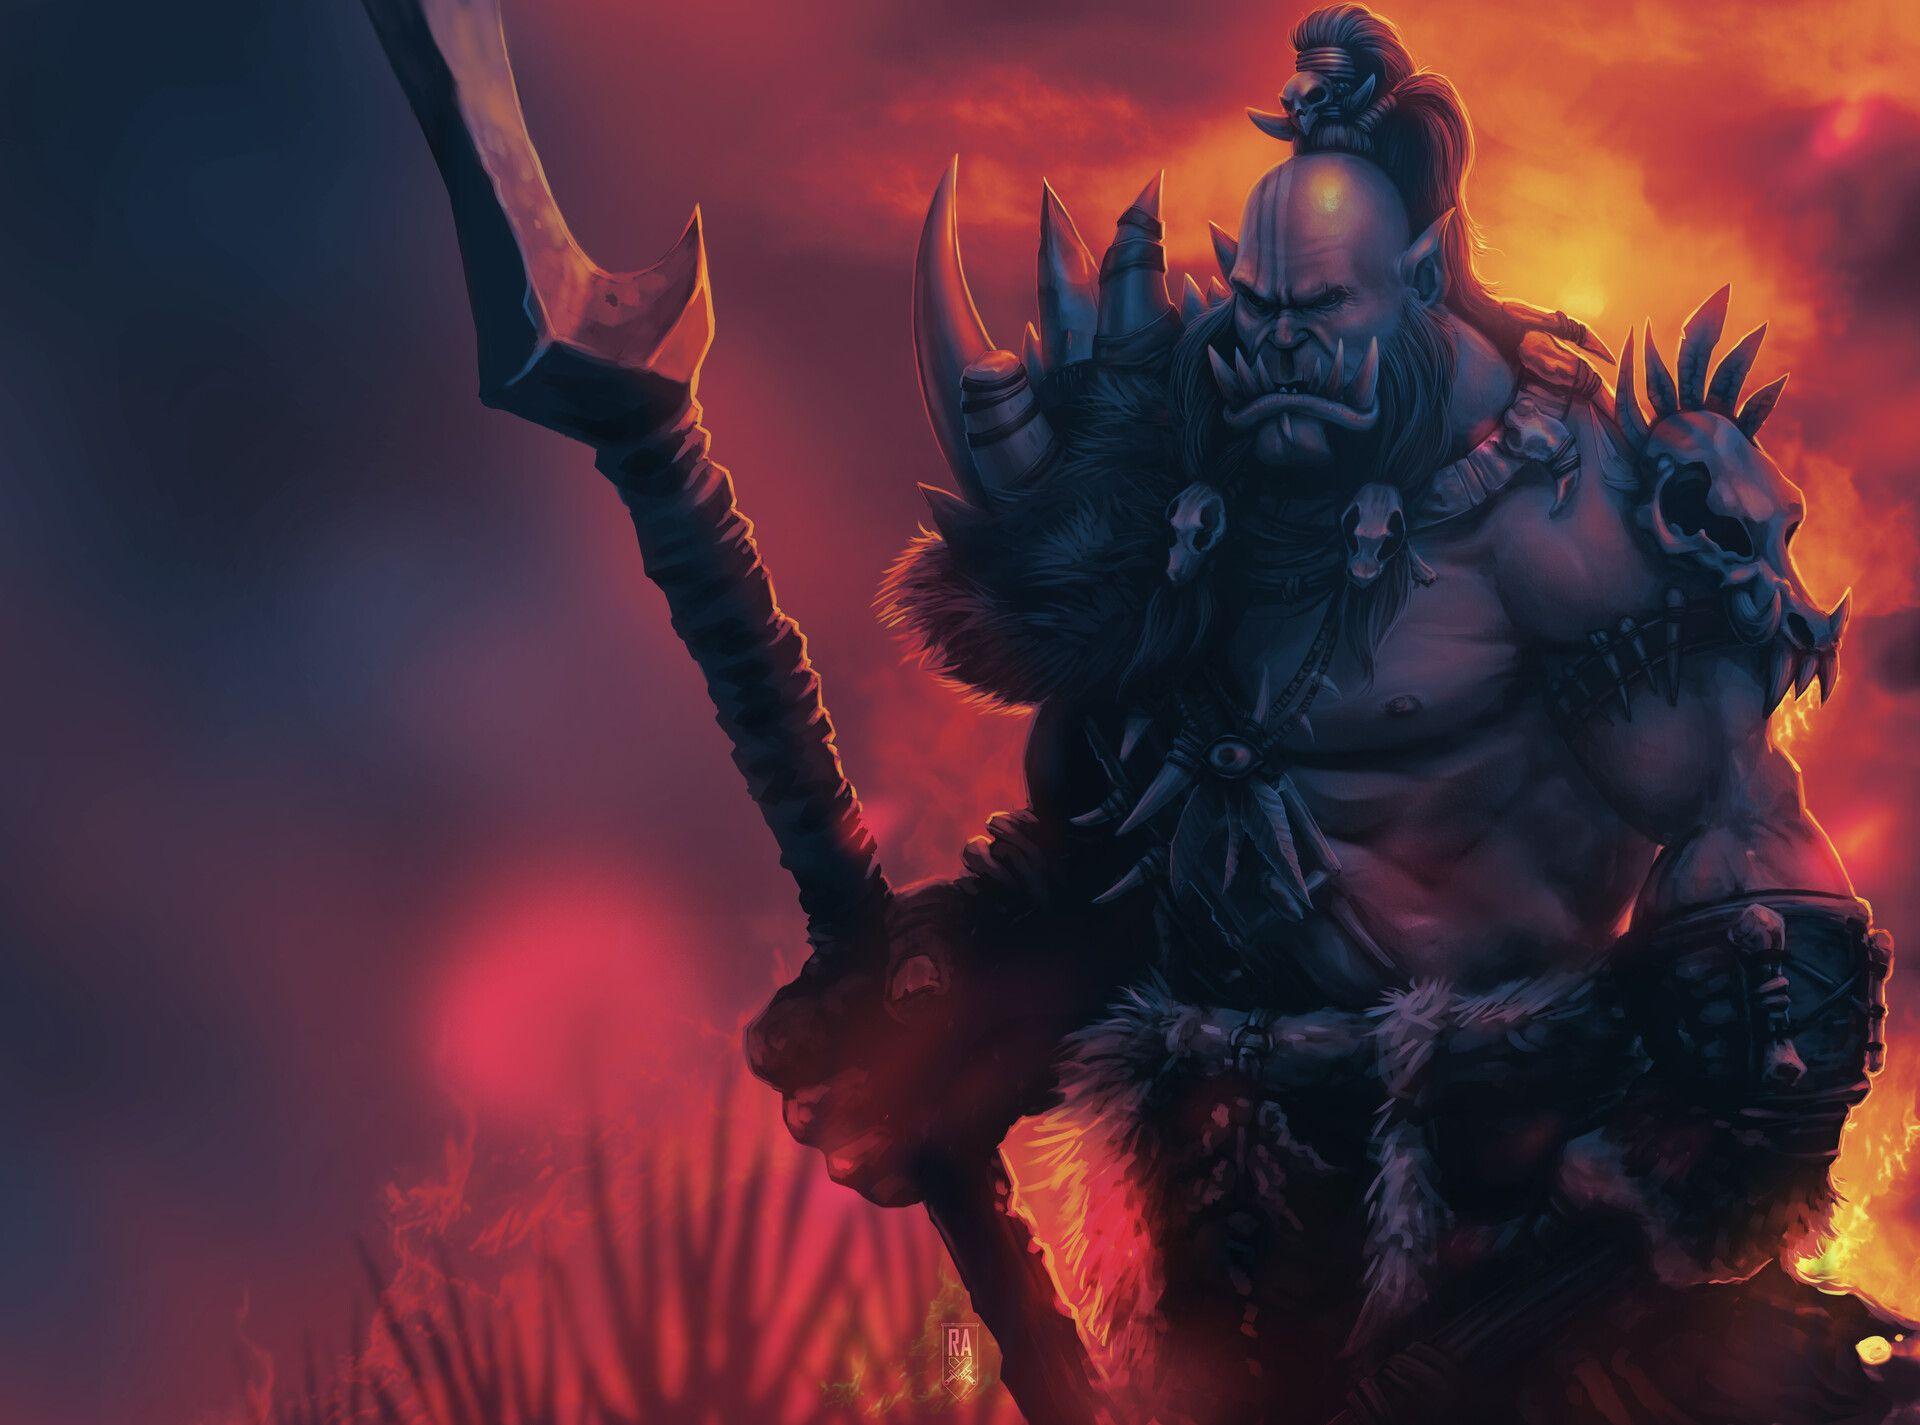 Videogame World Of Warcraft Warcraft World Of Warcraft Warrior